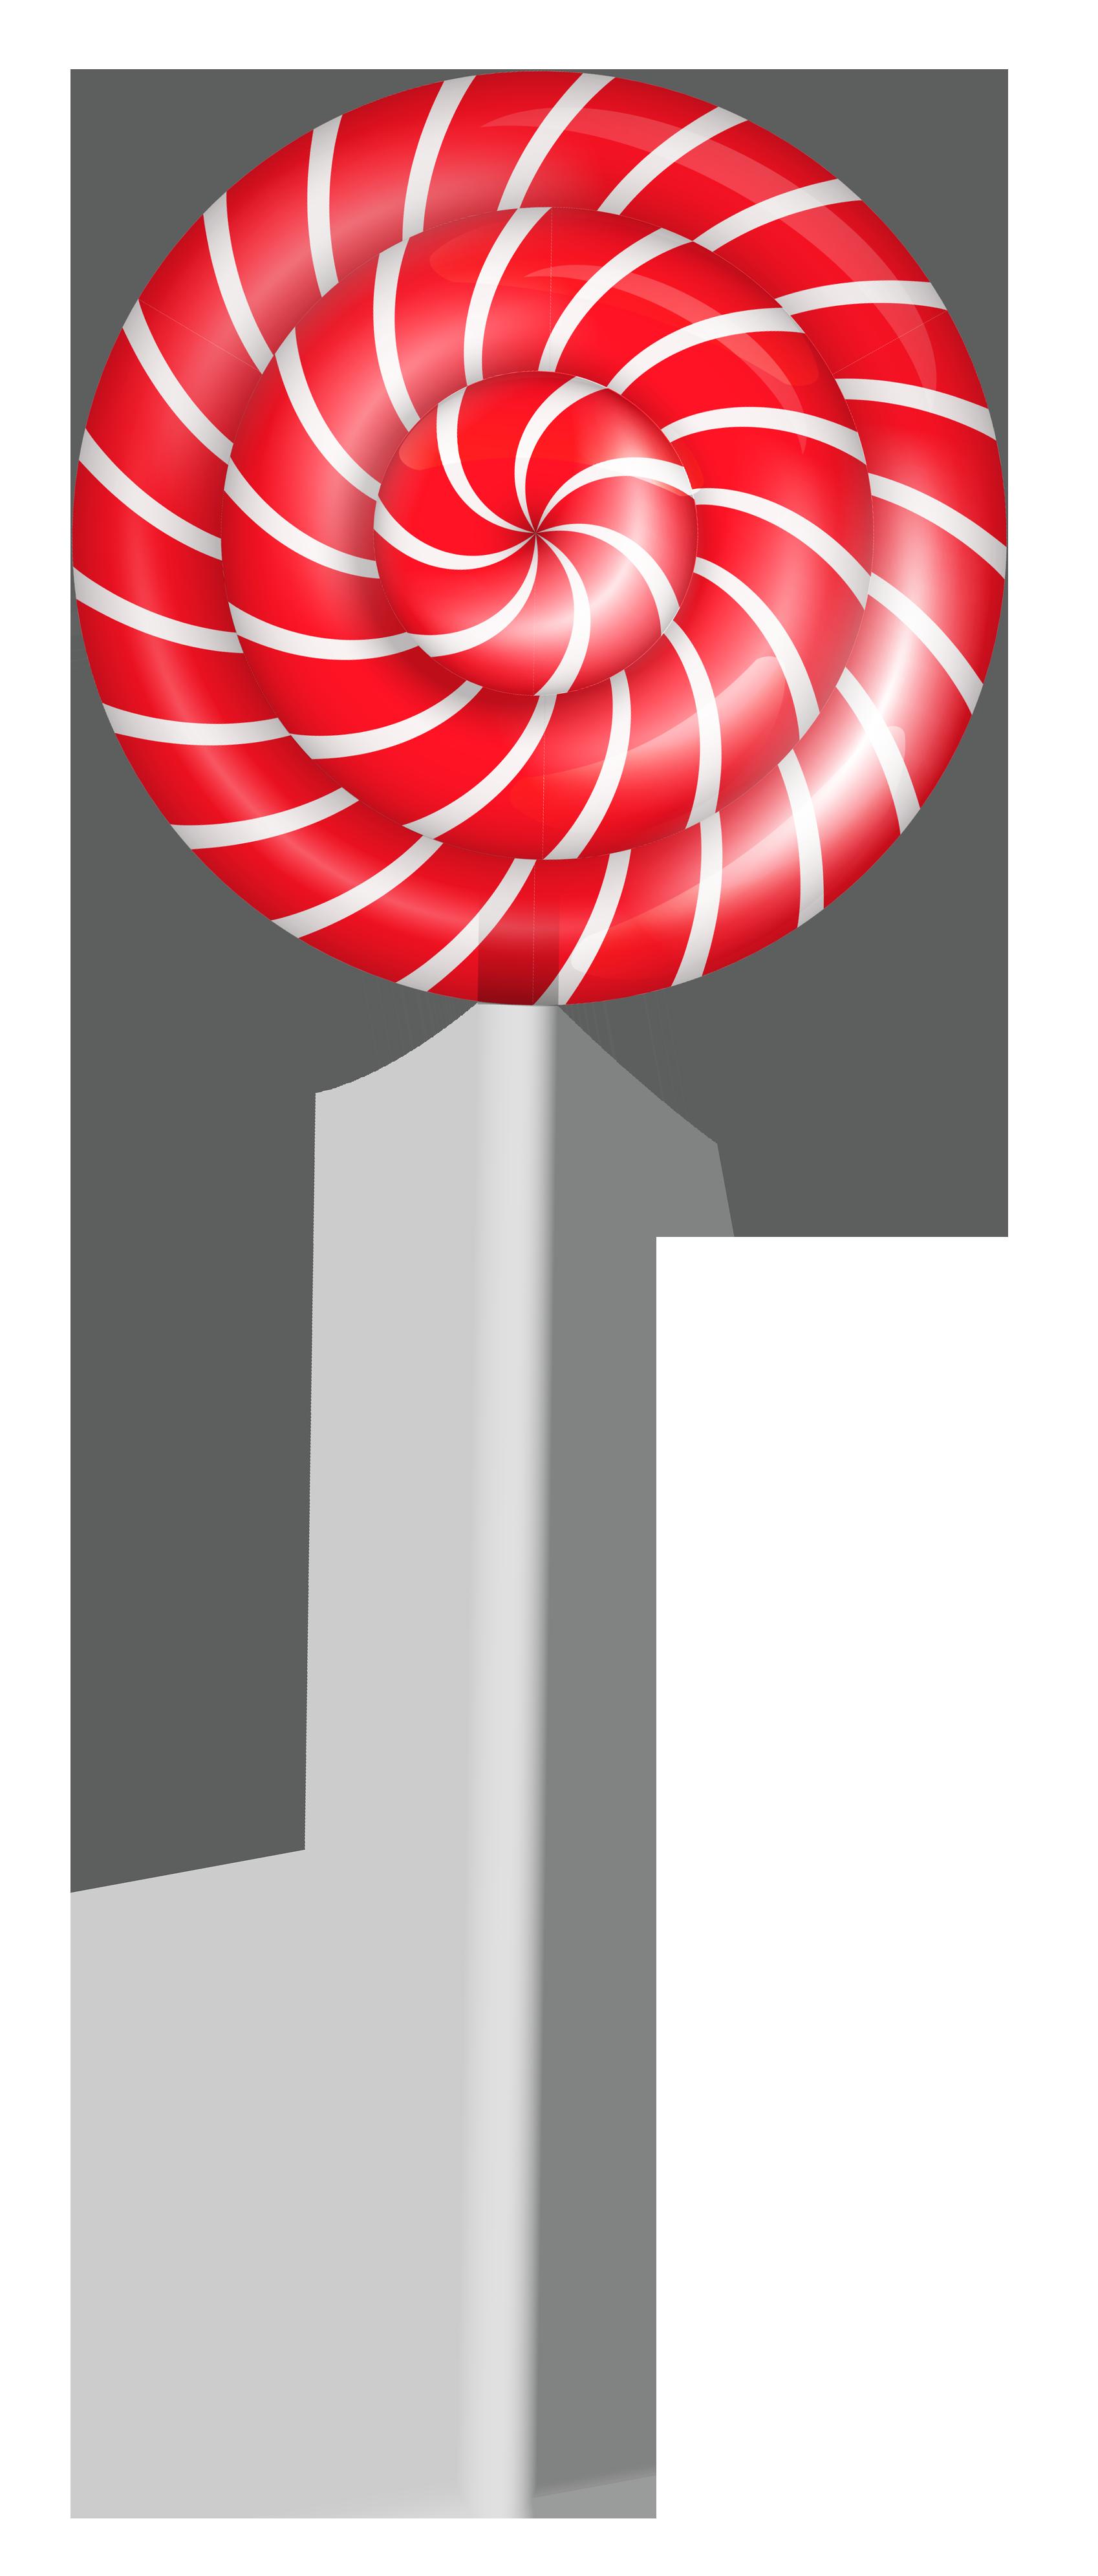 Striped png picture gallery. Lollipop clipart giant lollipop